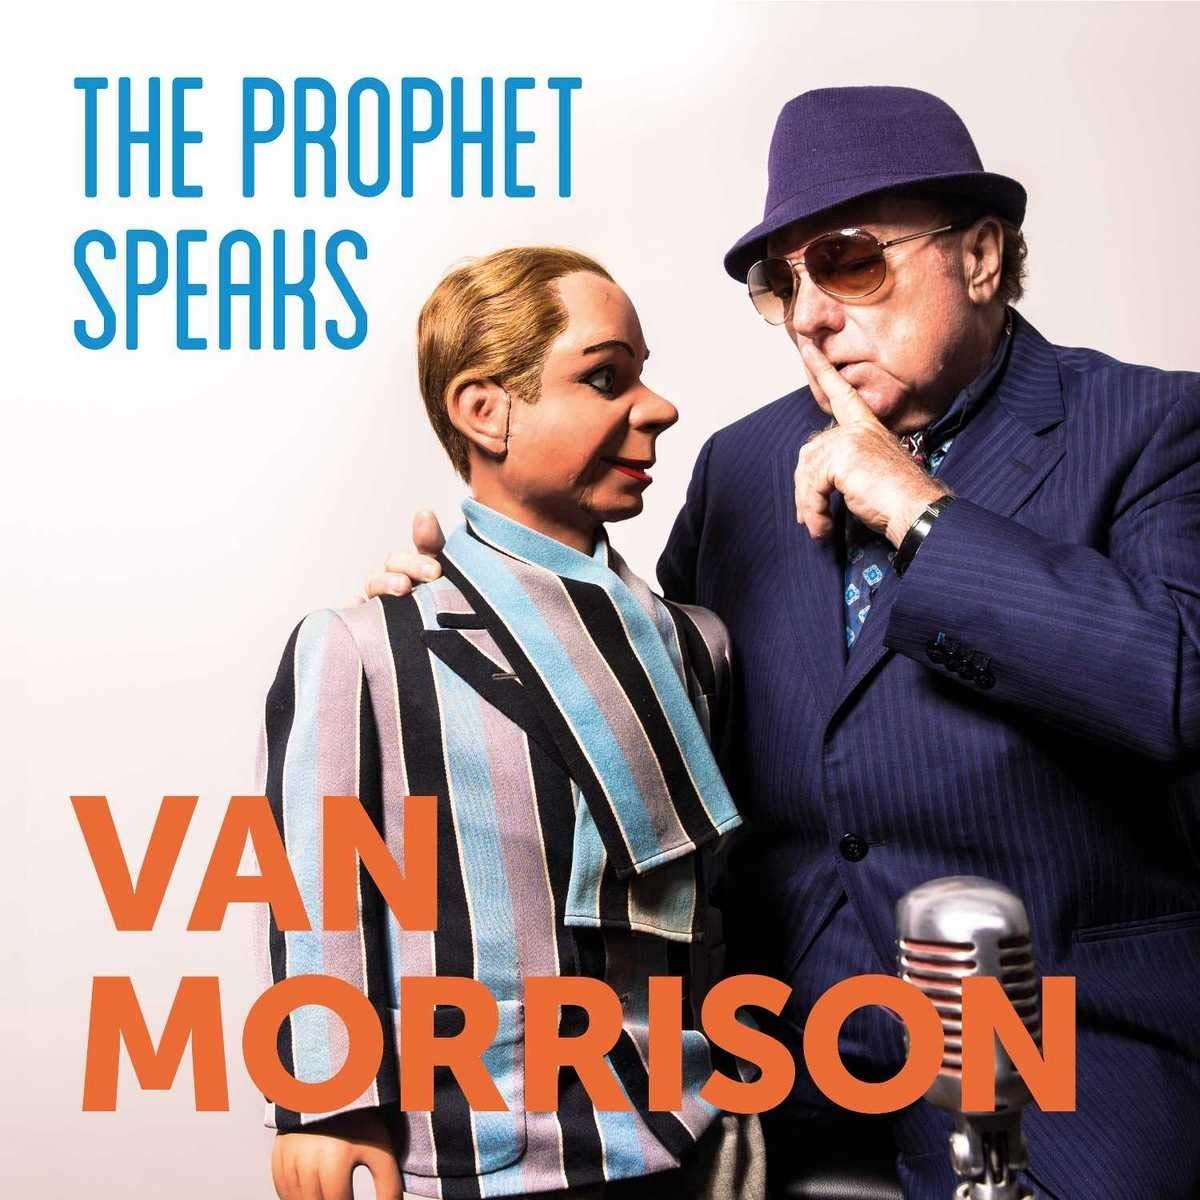 VAN MORRISON / ヴァン・モリソン / THE PROPHET SPEAKS (2LP)